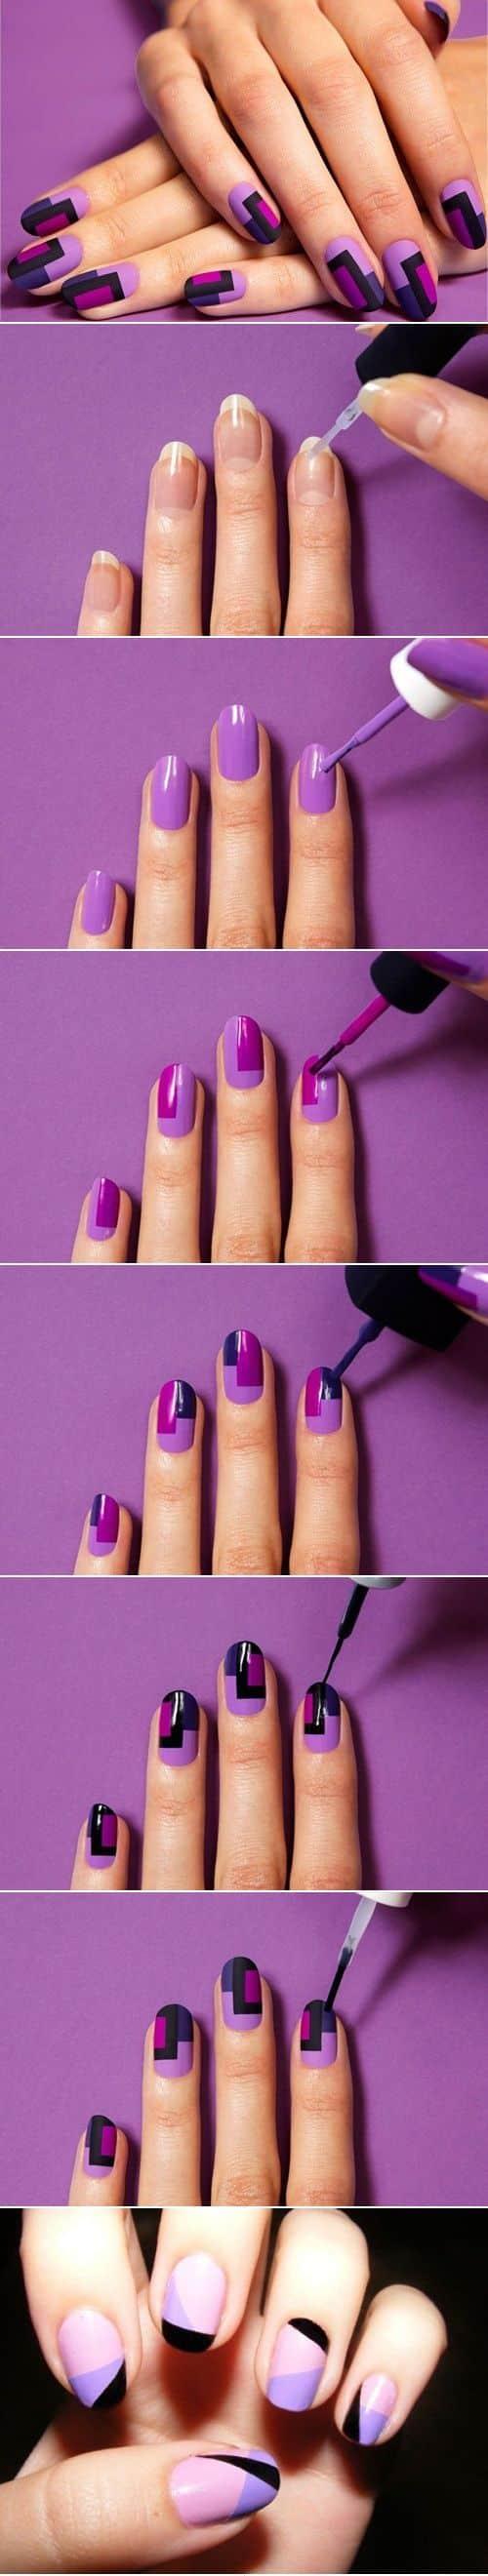 diseño de uñas moradas1